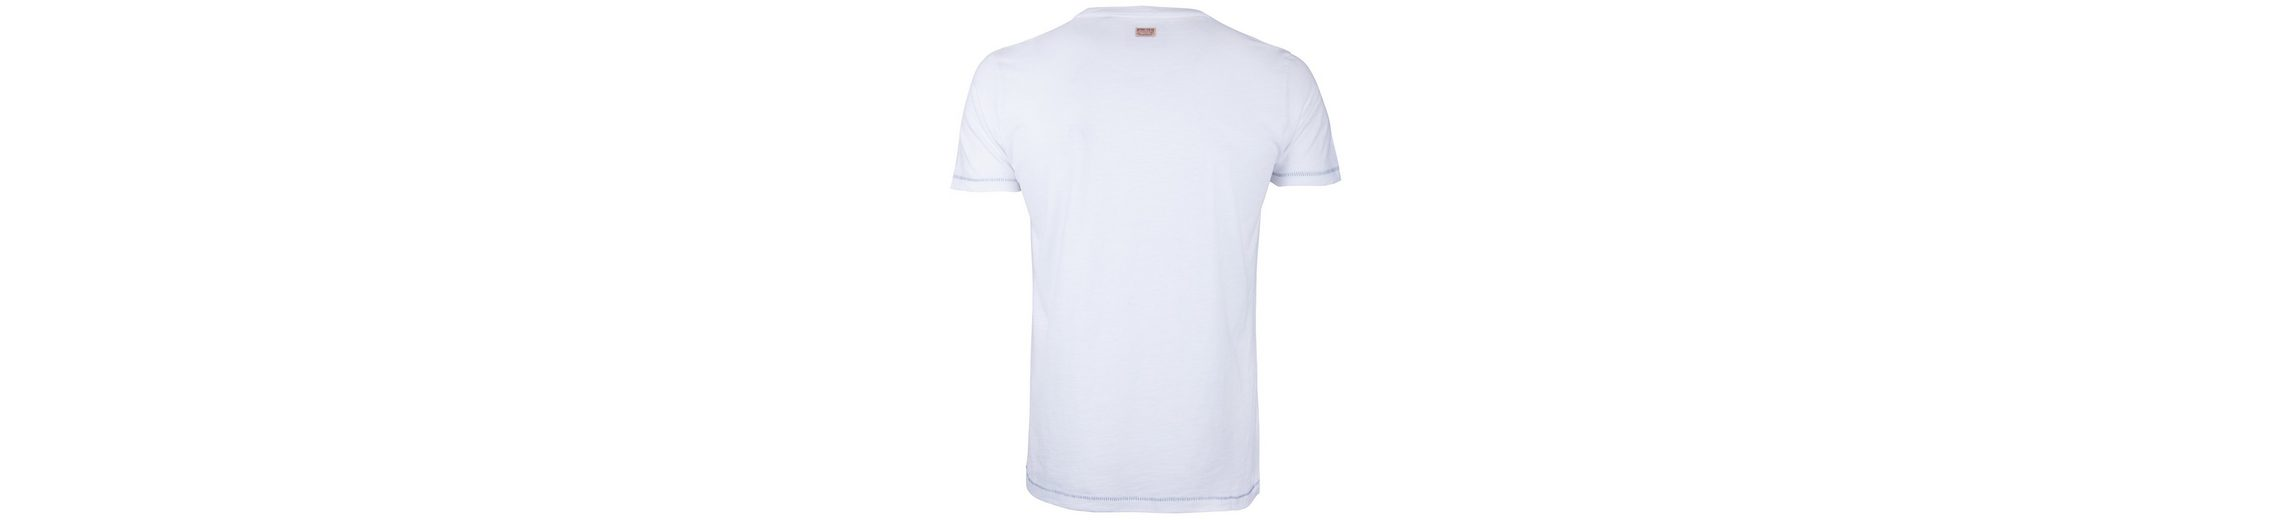 Petrol Industries T-Shirt Billig Verkauf Manchester m3GxLXjF